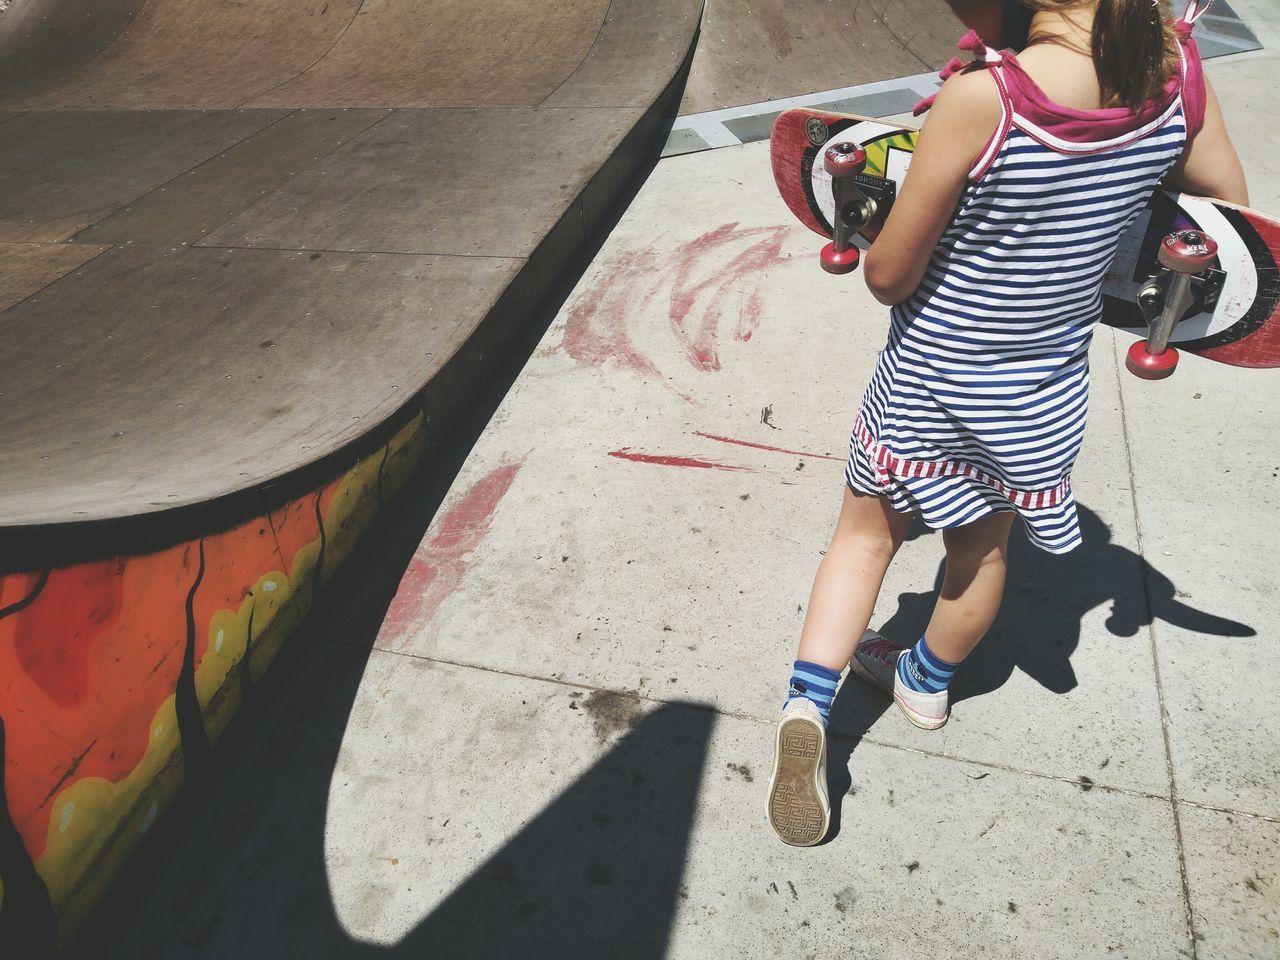 Skateboarder Skatelife Skategirl Childhood Leisure Activity Sunlight Lifestyles Skatepark Skate Park Skill  Sports Training Casual Clothing Dress Miniramp The Street Photographer - 2017 EyeEm Awards